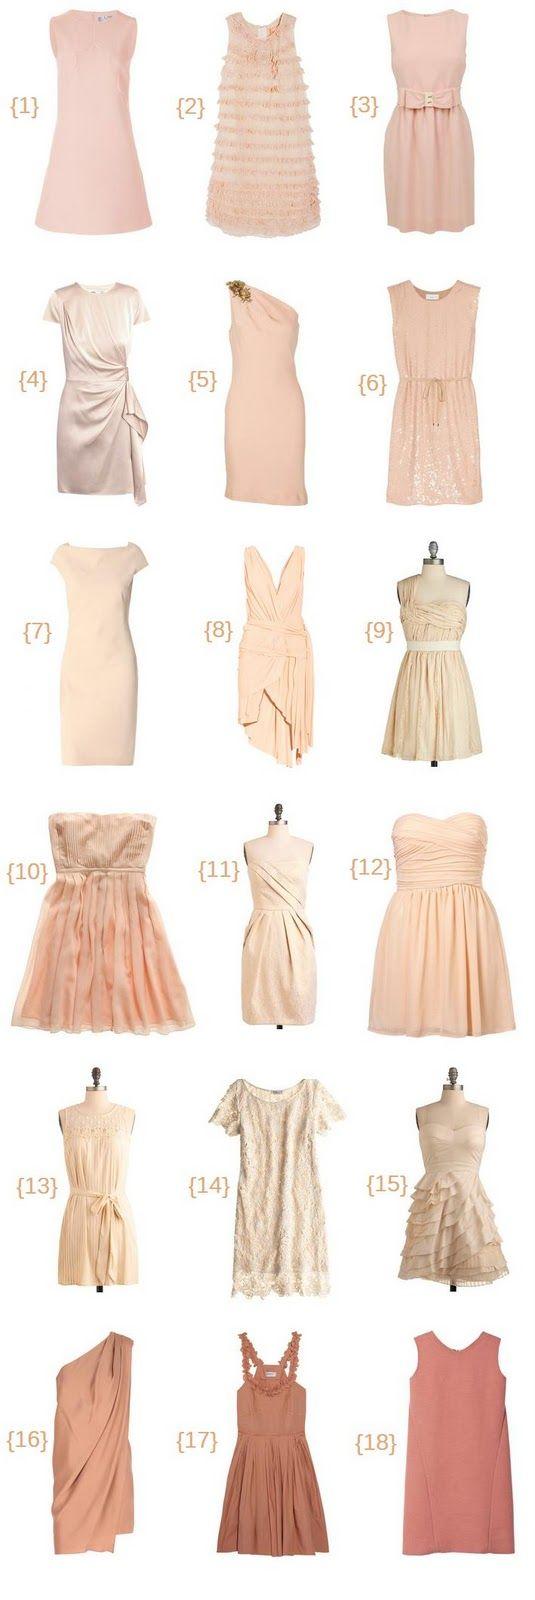 Blush bridesmaid dresses. Stevie